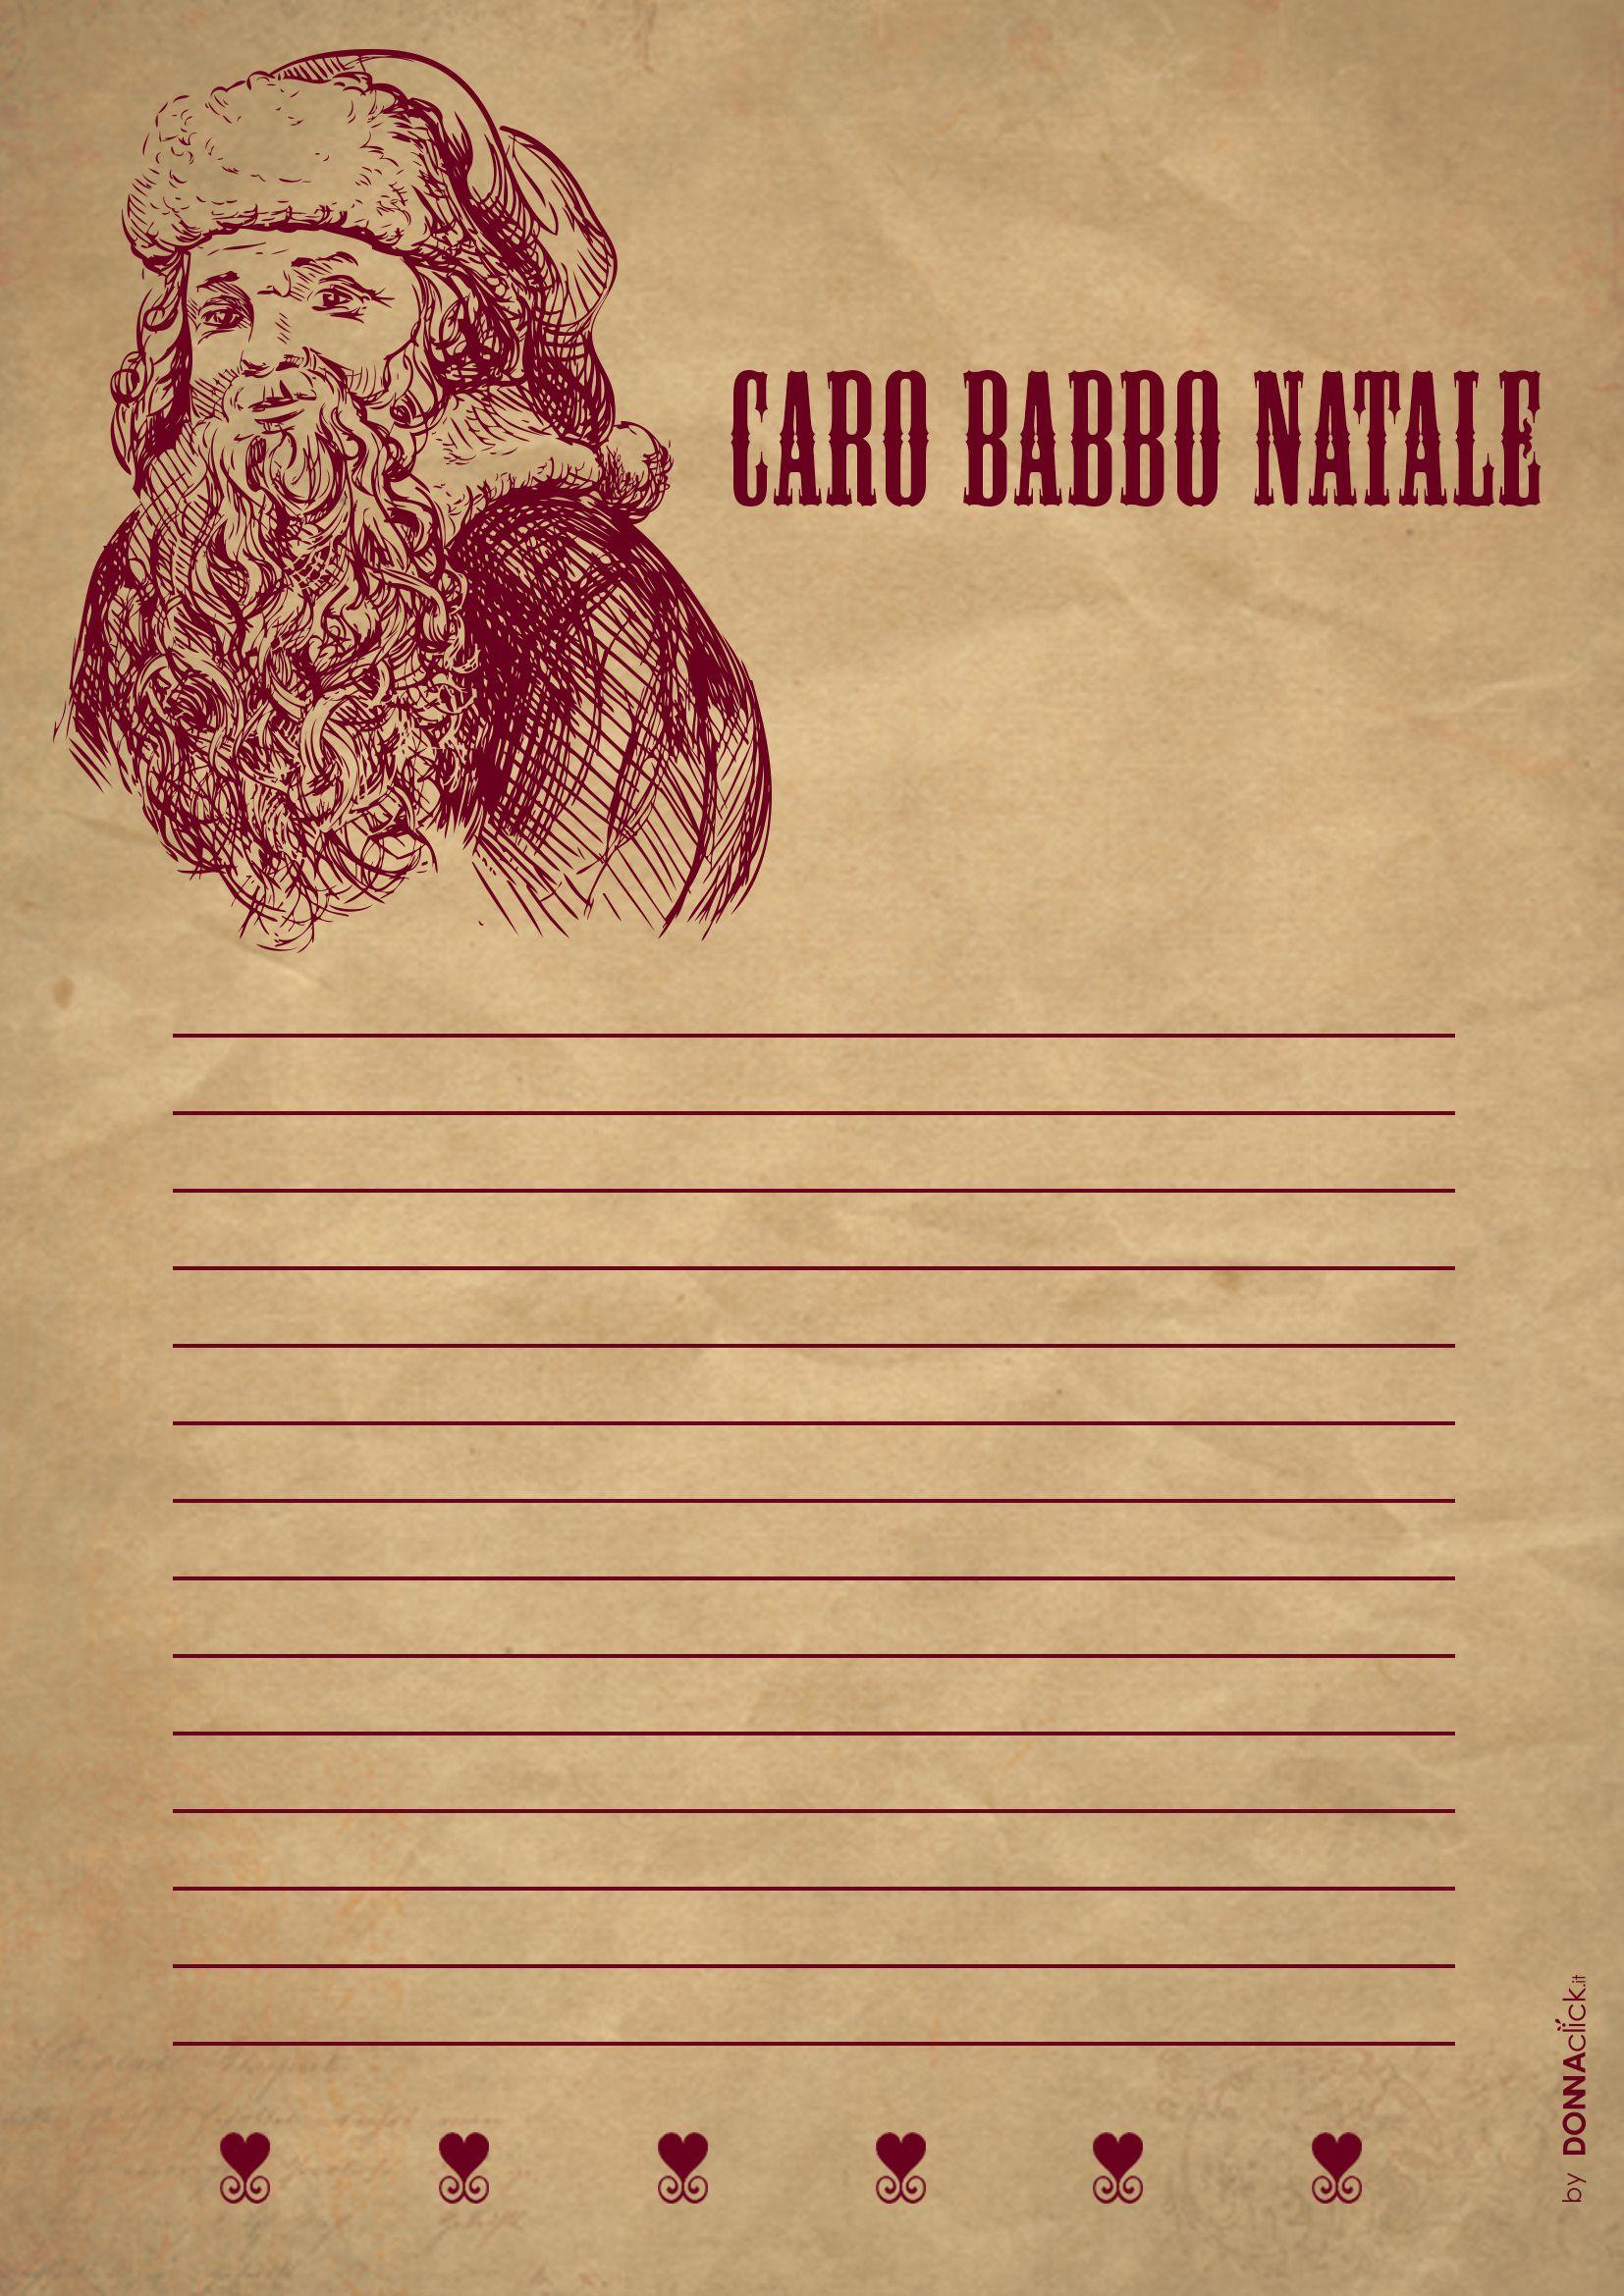 Le Lettere Di Babbo Natale.Letterina Vintage Per Babbo Natale Lettere Di Babbo Natale Babbo